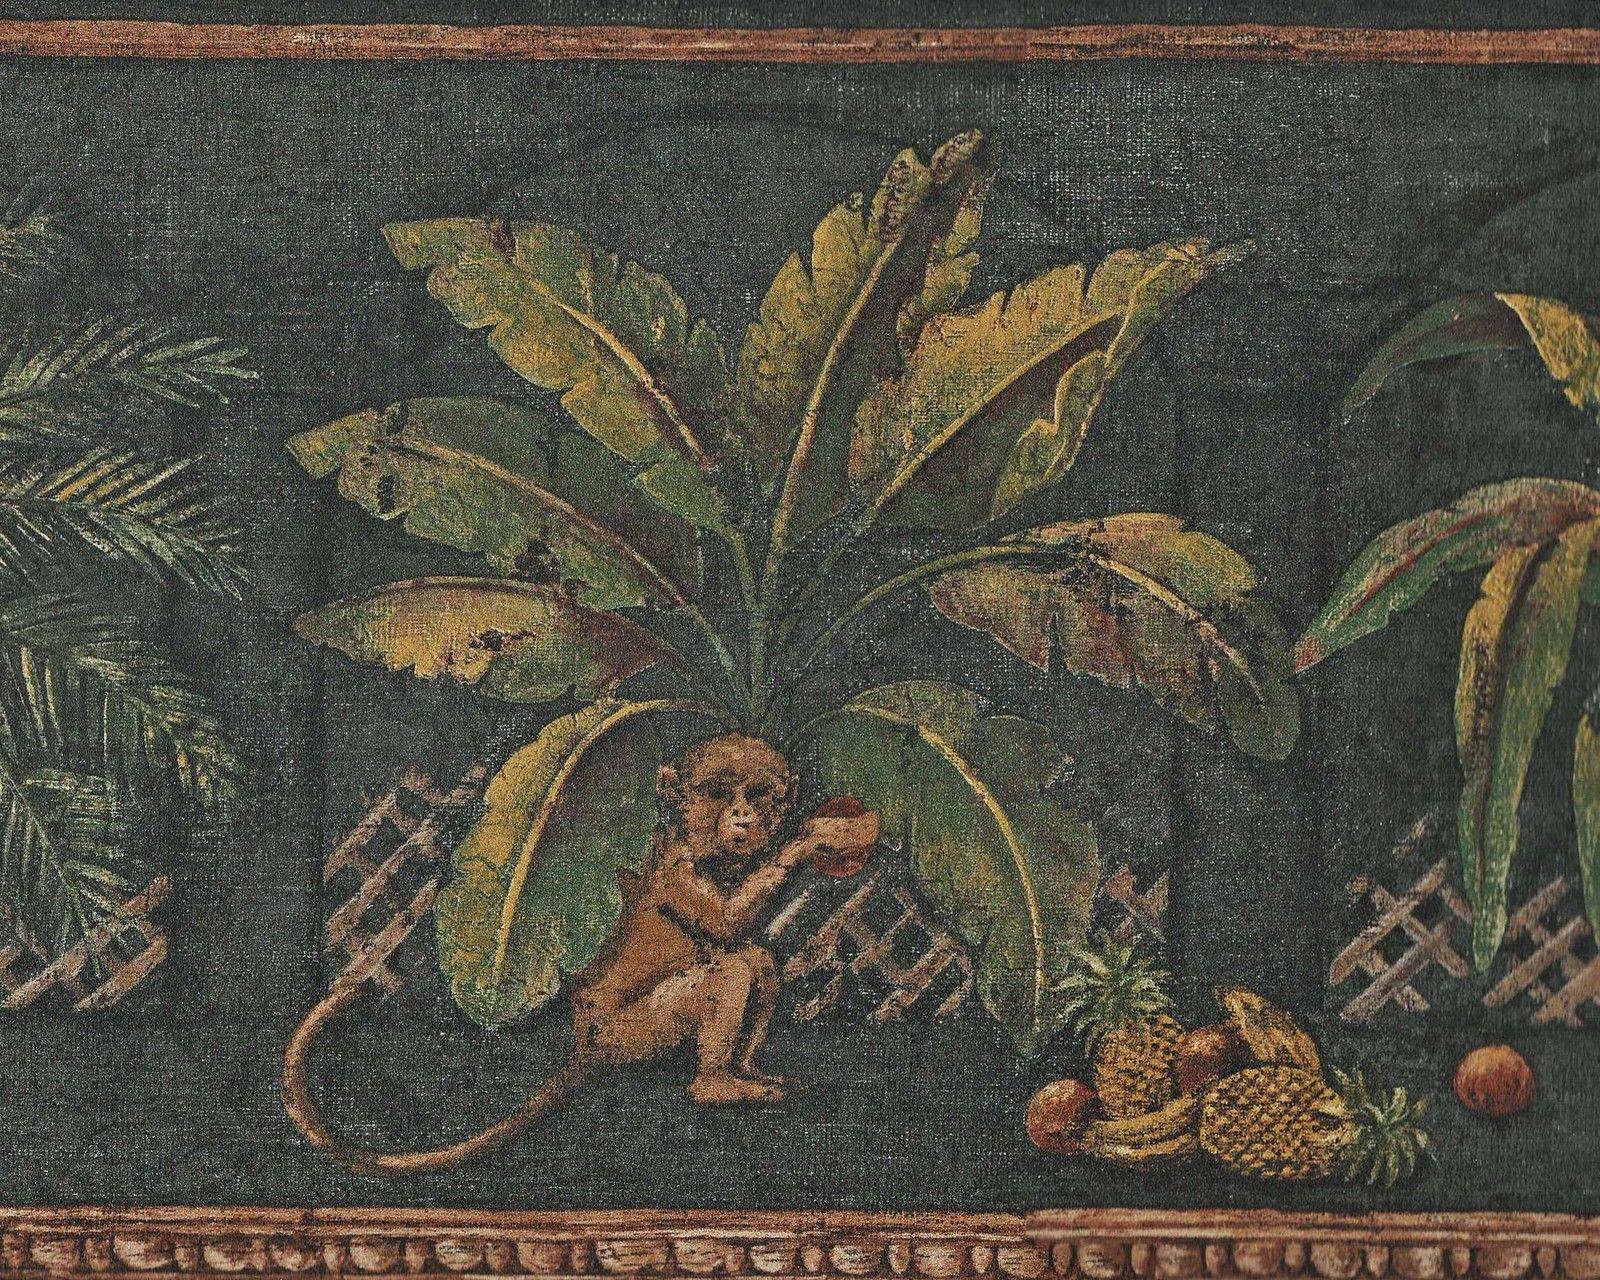 Sale Tropical Palm Tree Leaves Black Background Wallpaper Border 1600x1280